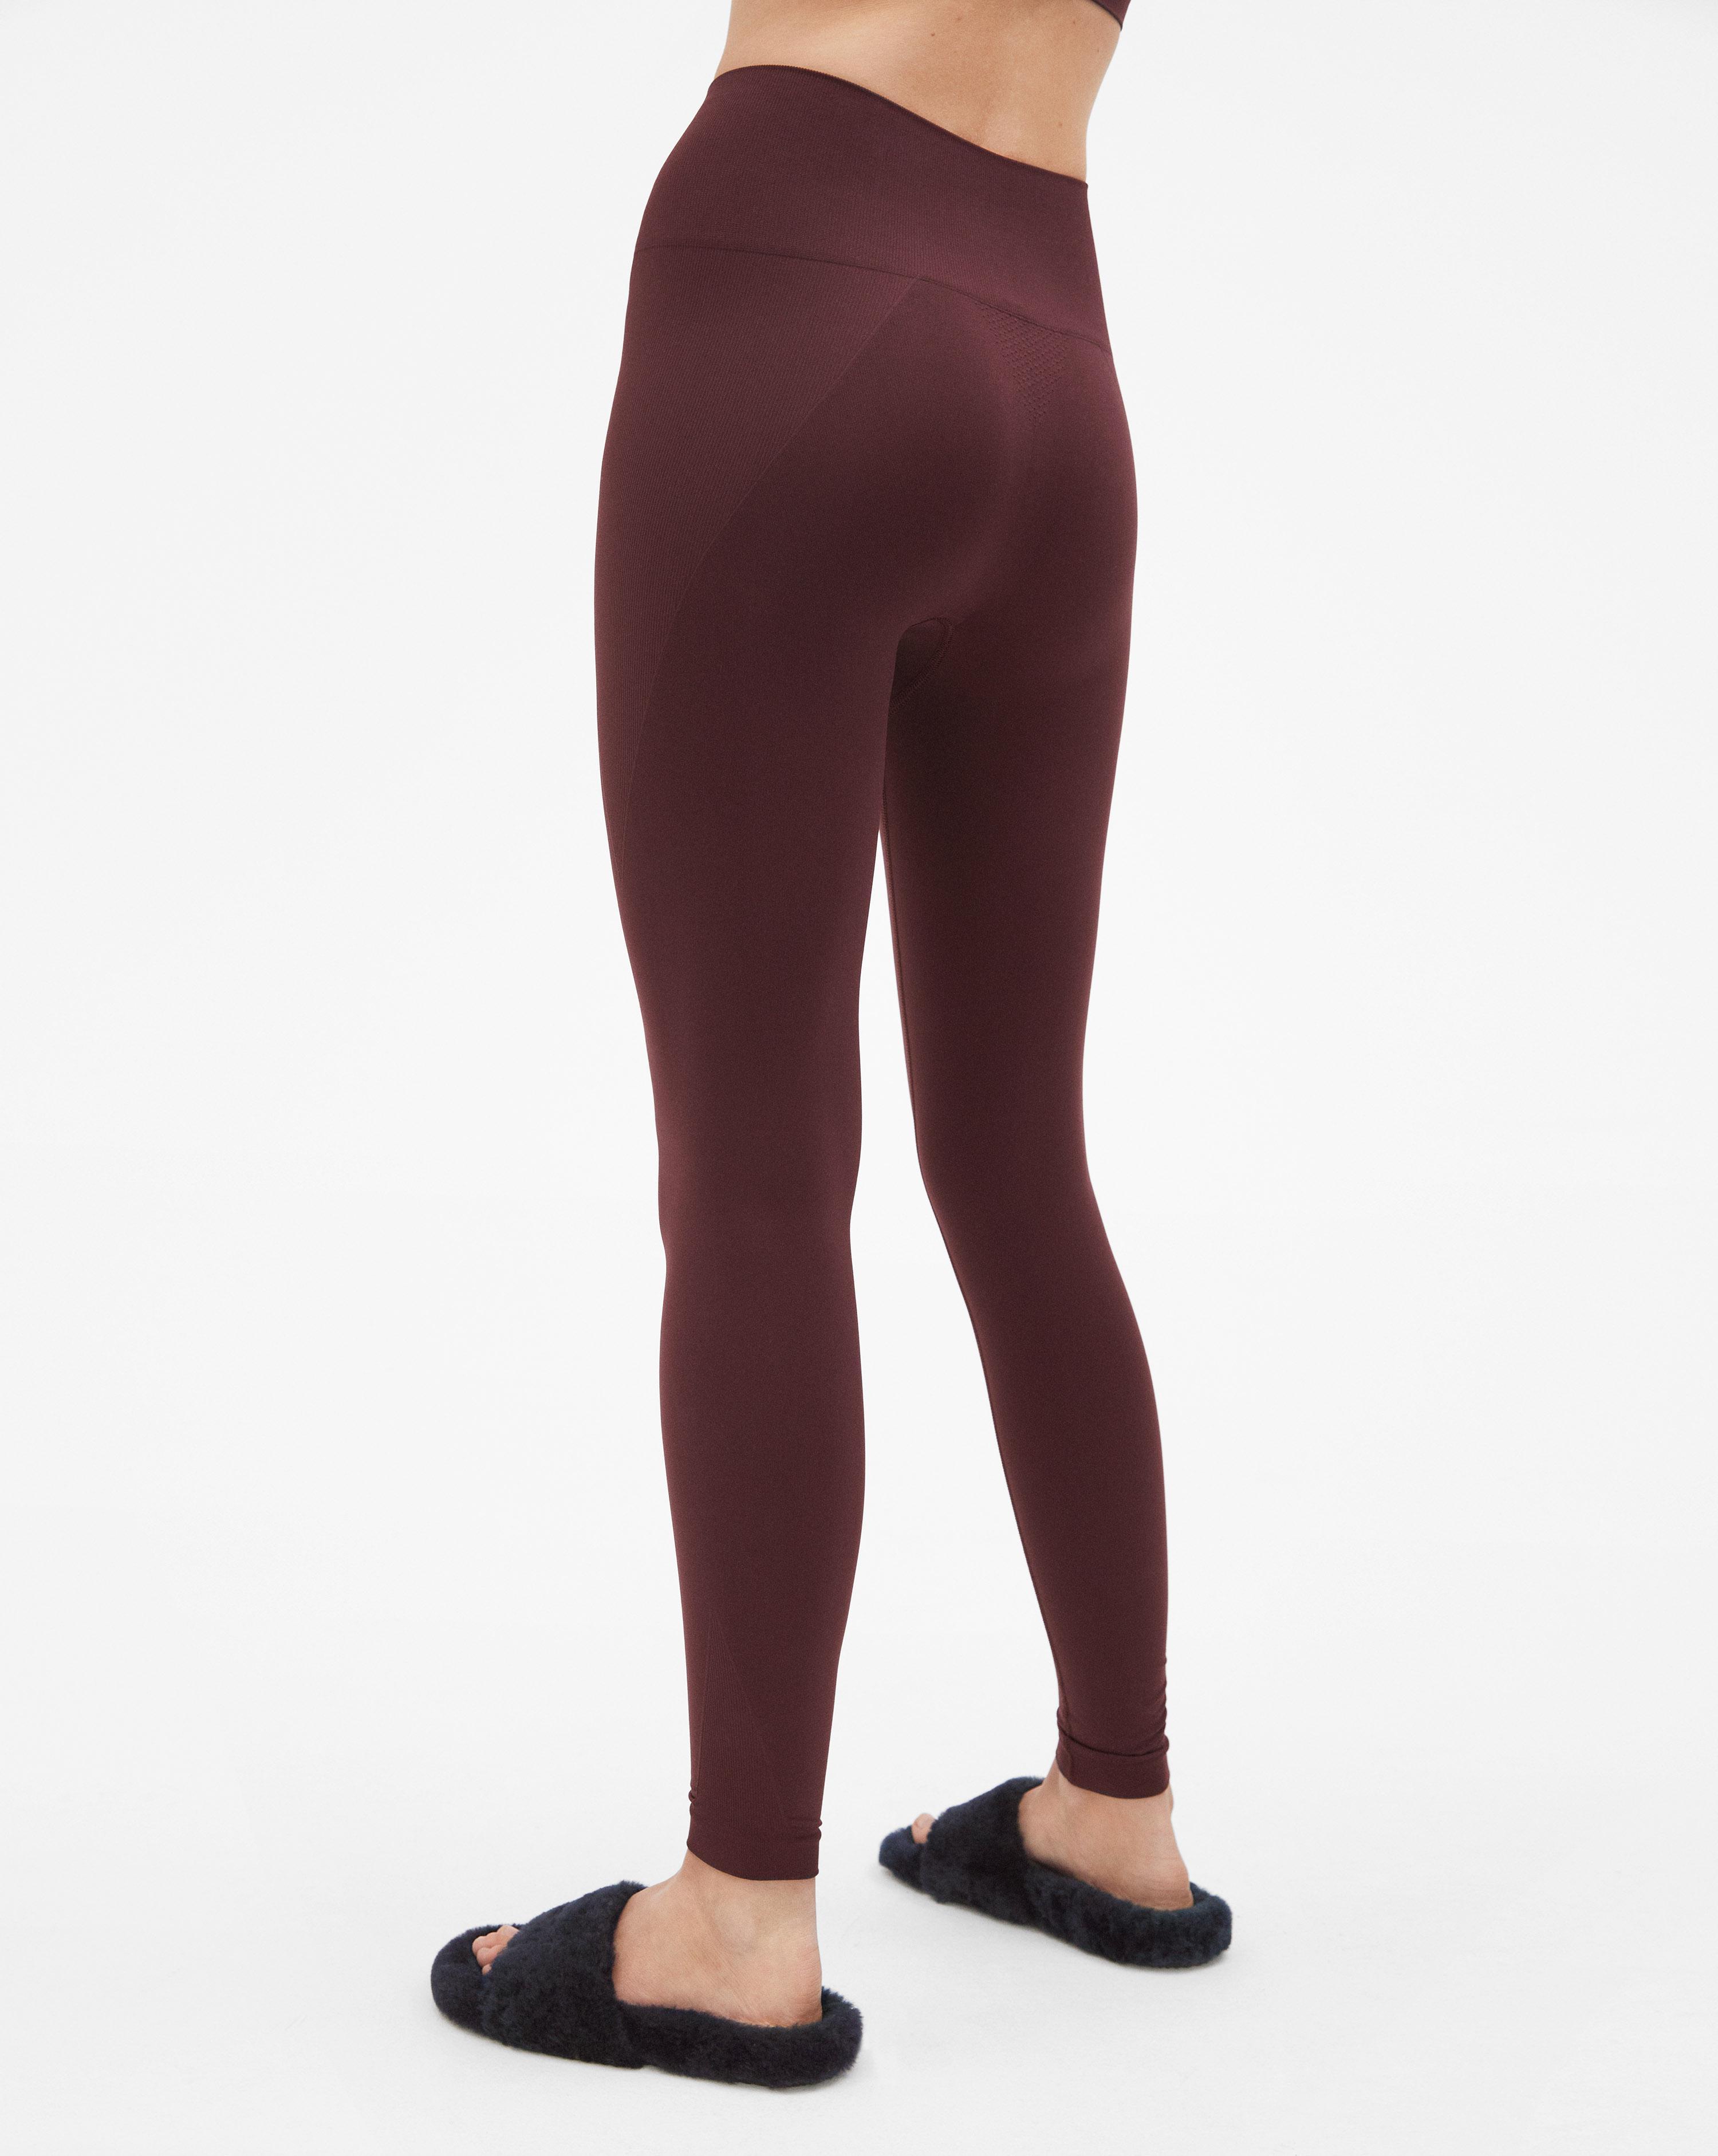 filippa k yoga leggings